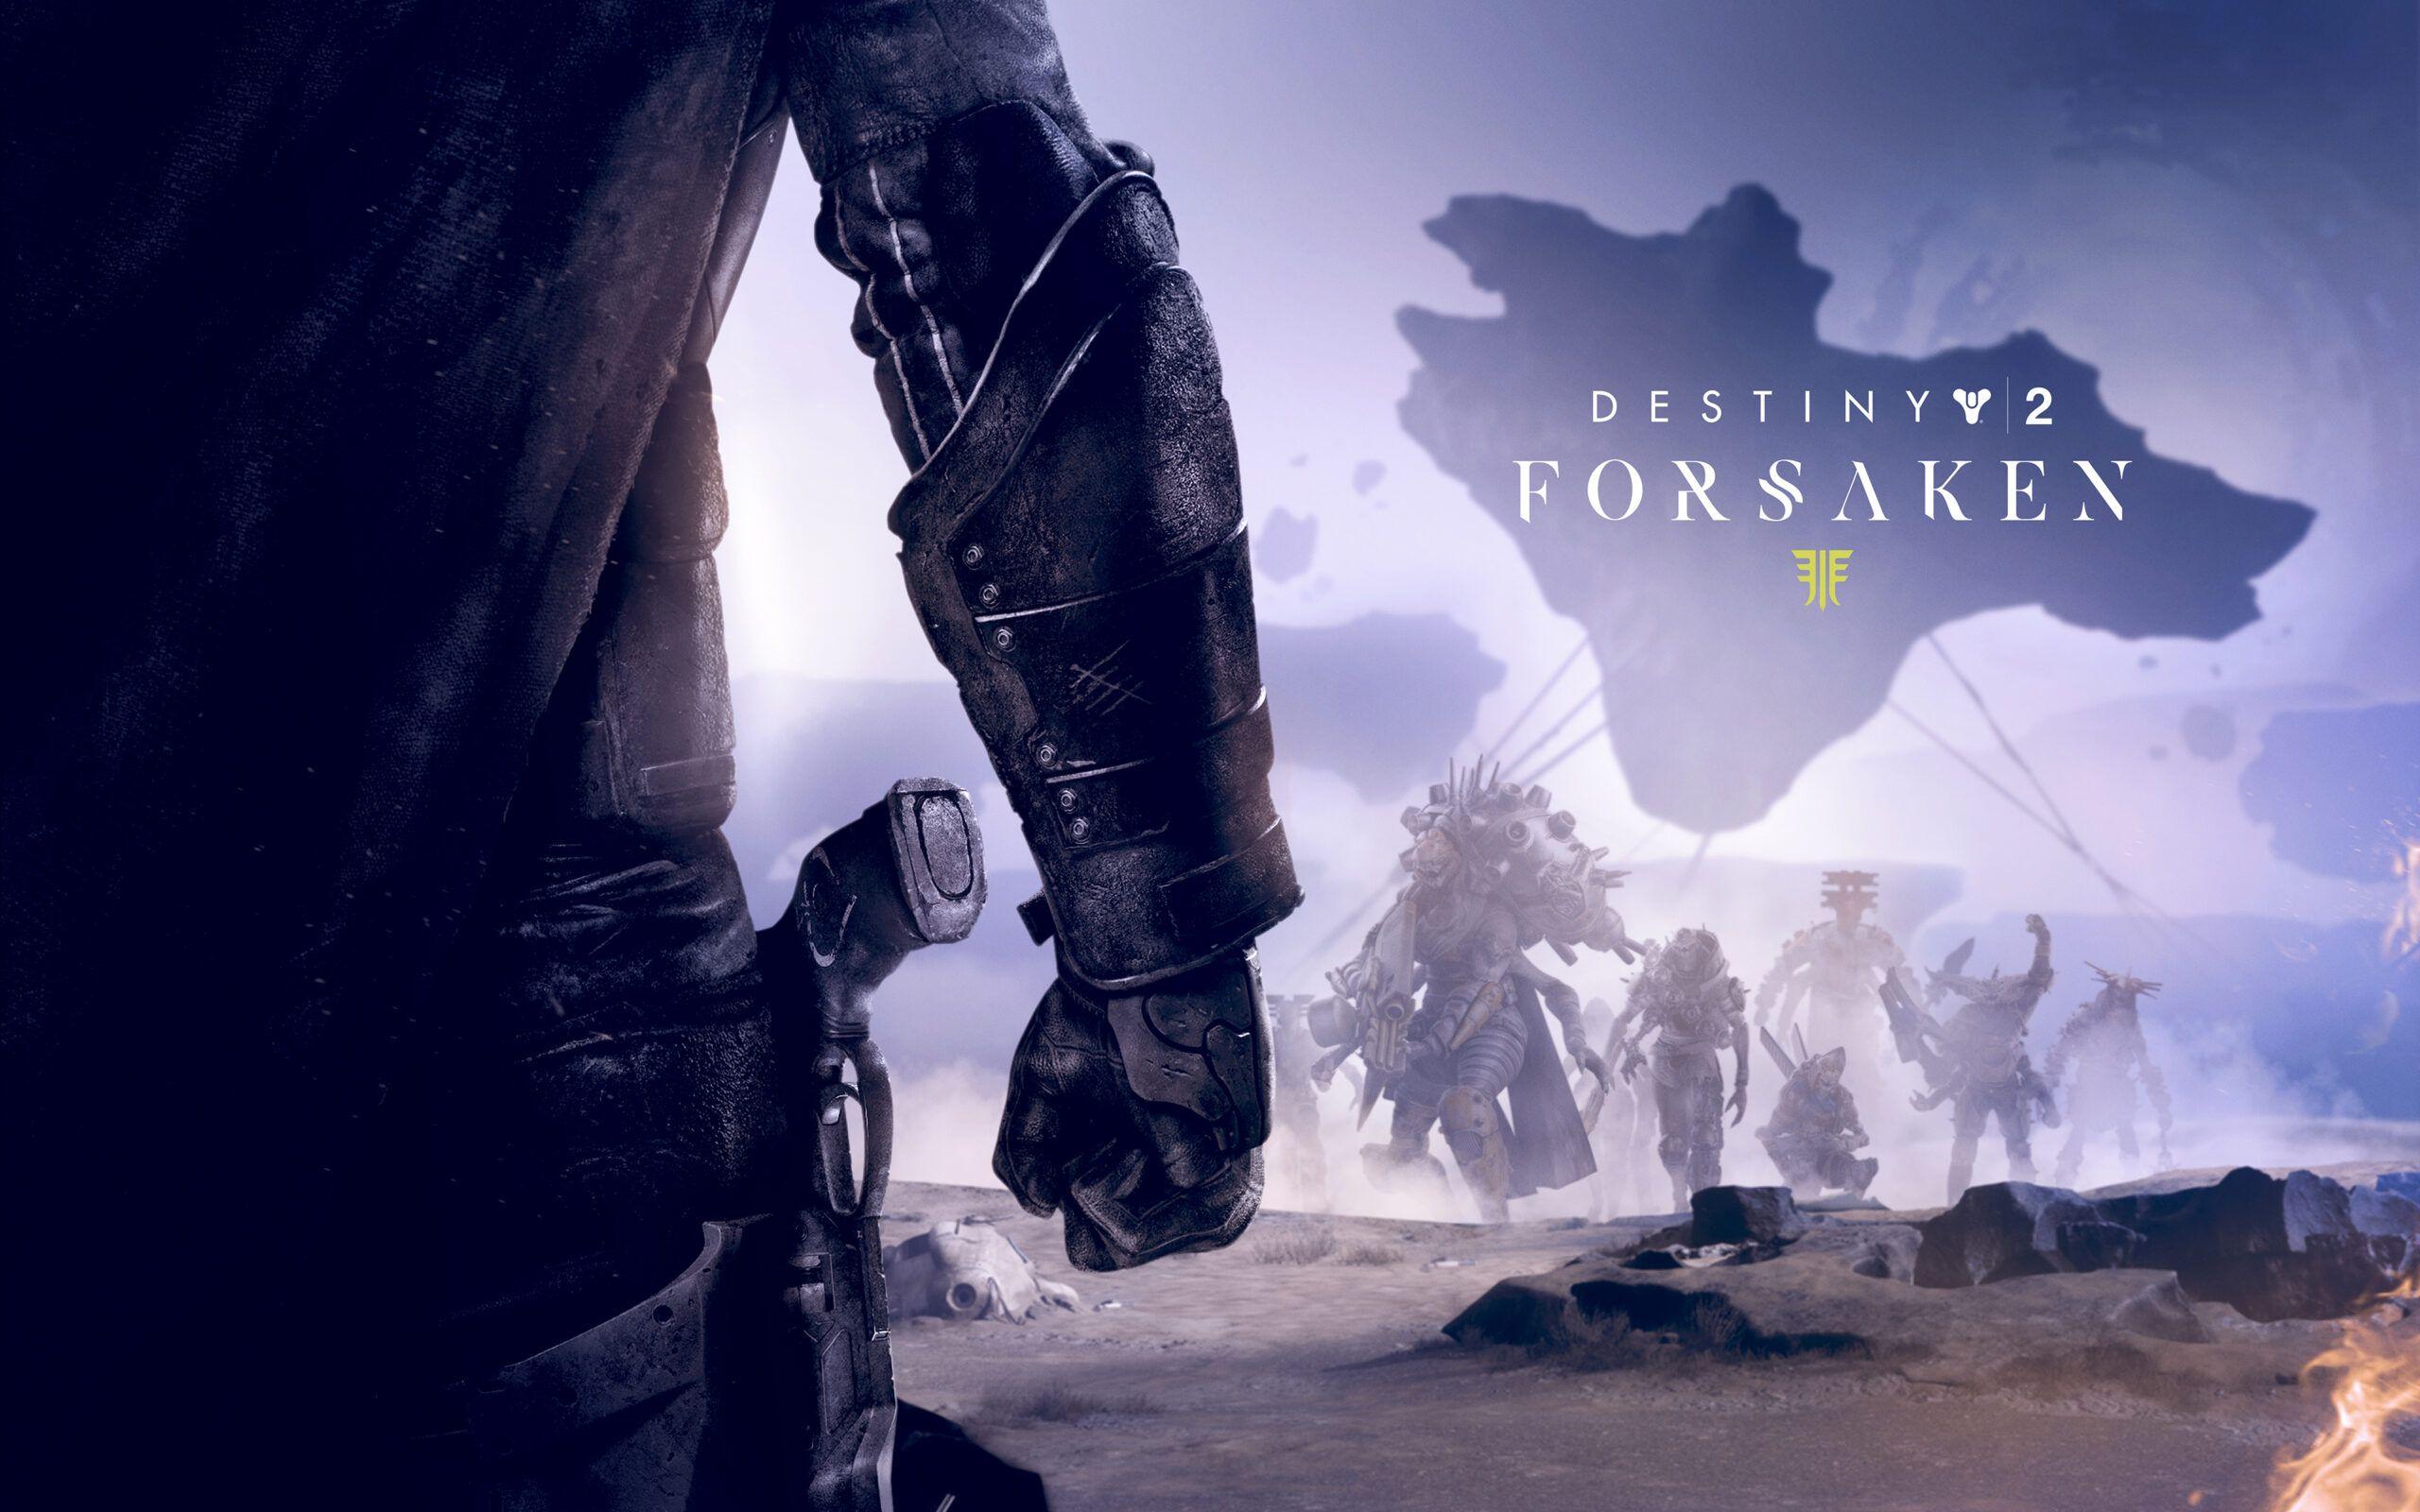 Destiny 1 Wallpaper In 2020 Destiny Game Destiny Poster Prints